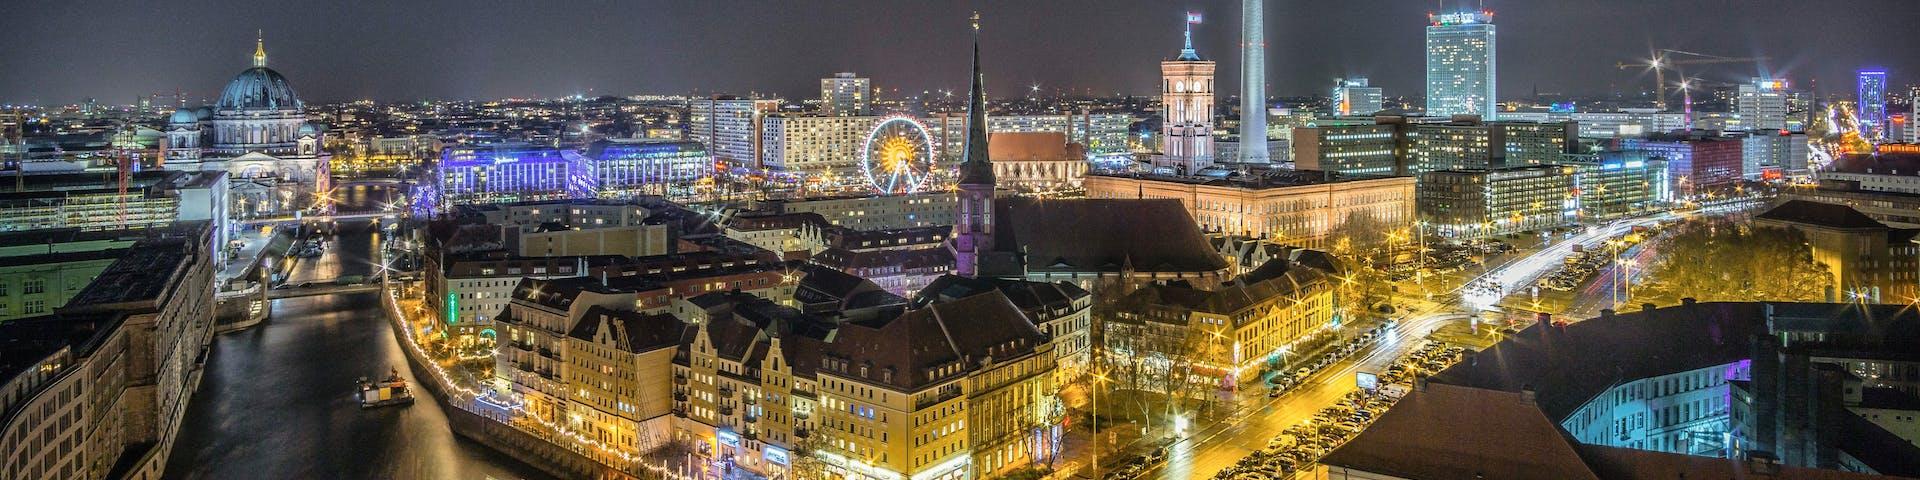 Top 10 Best Universities in Germany in 2019 - MastersPortal com